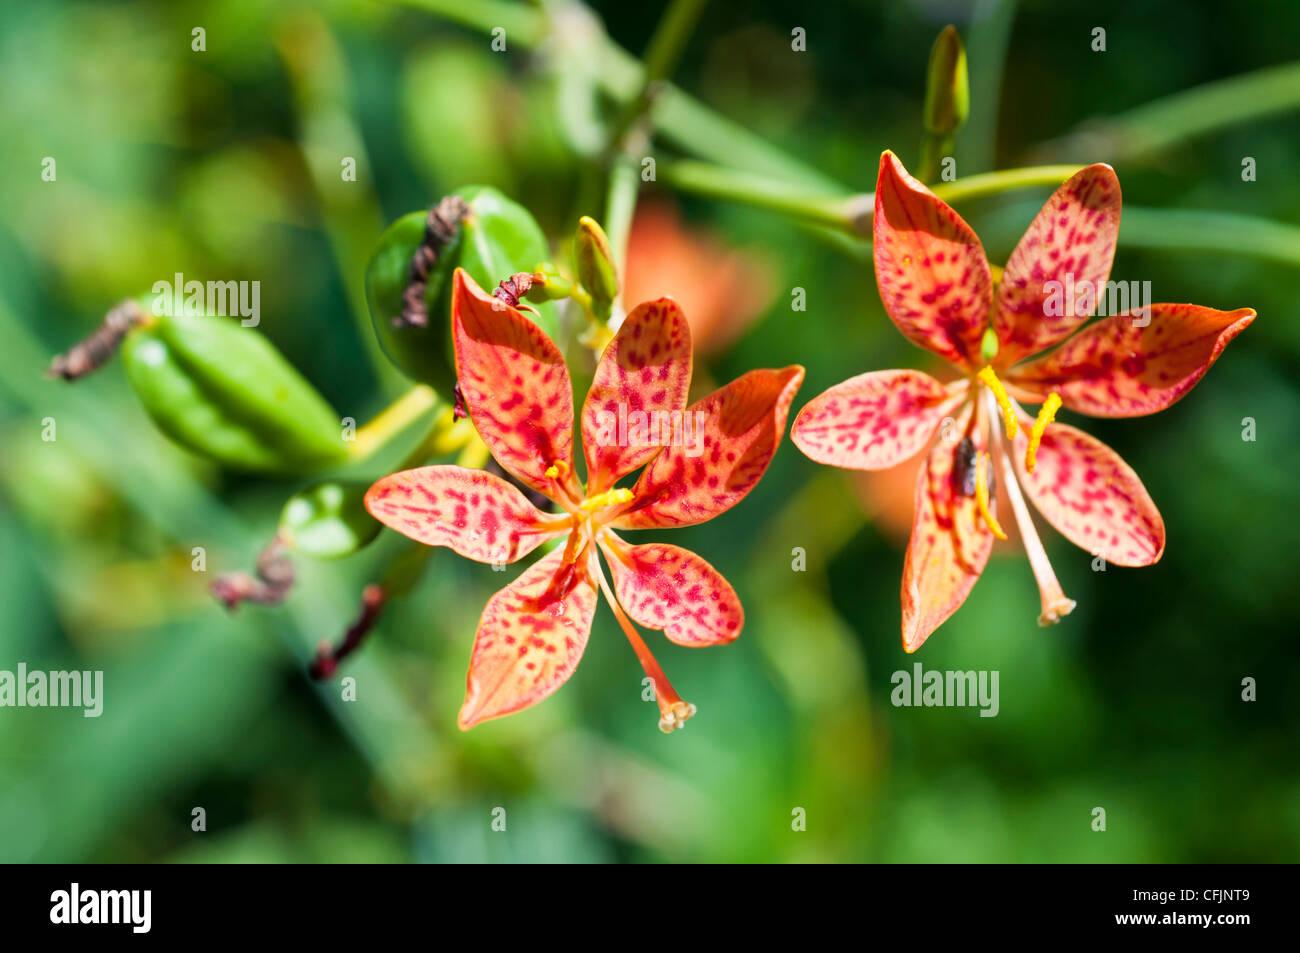 Blackberry Lilly, Belamcanda chinensis, Iridaceae, Chinese medicinal plant - Stock Image